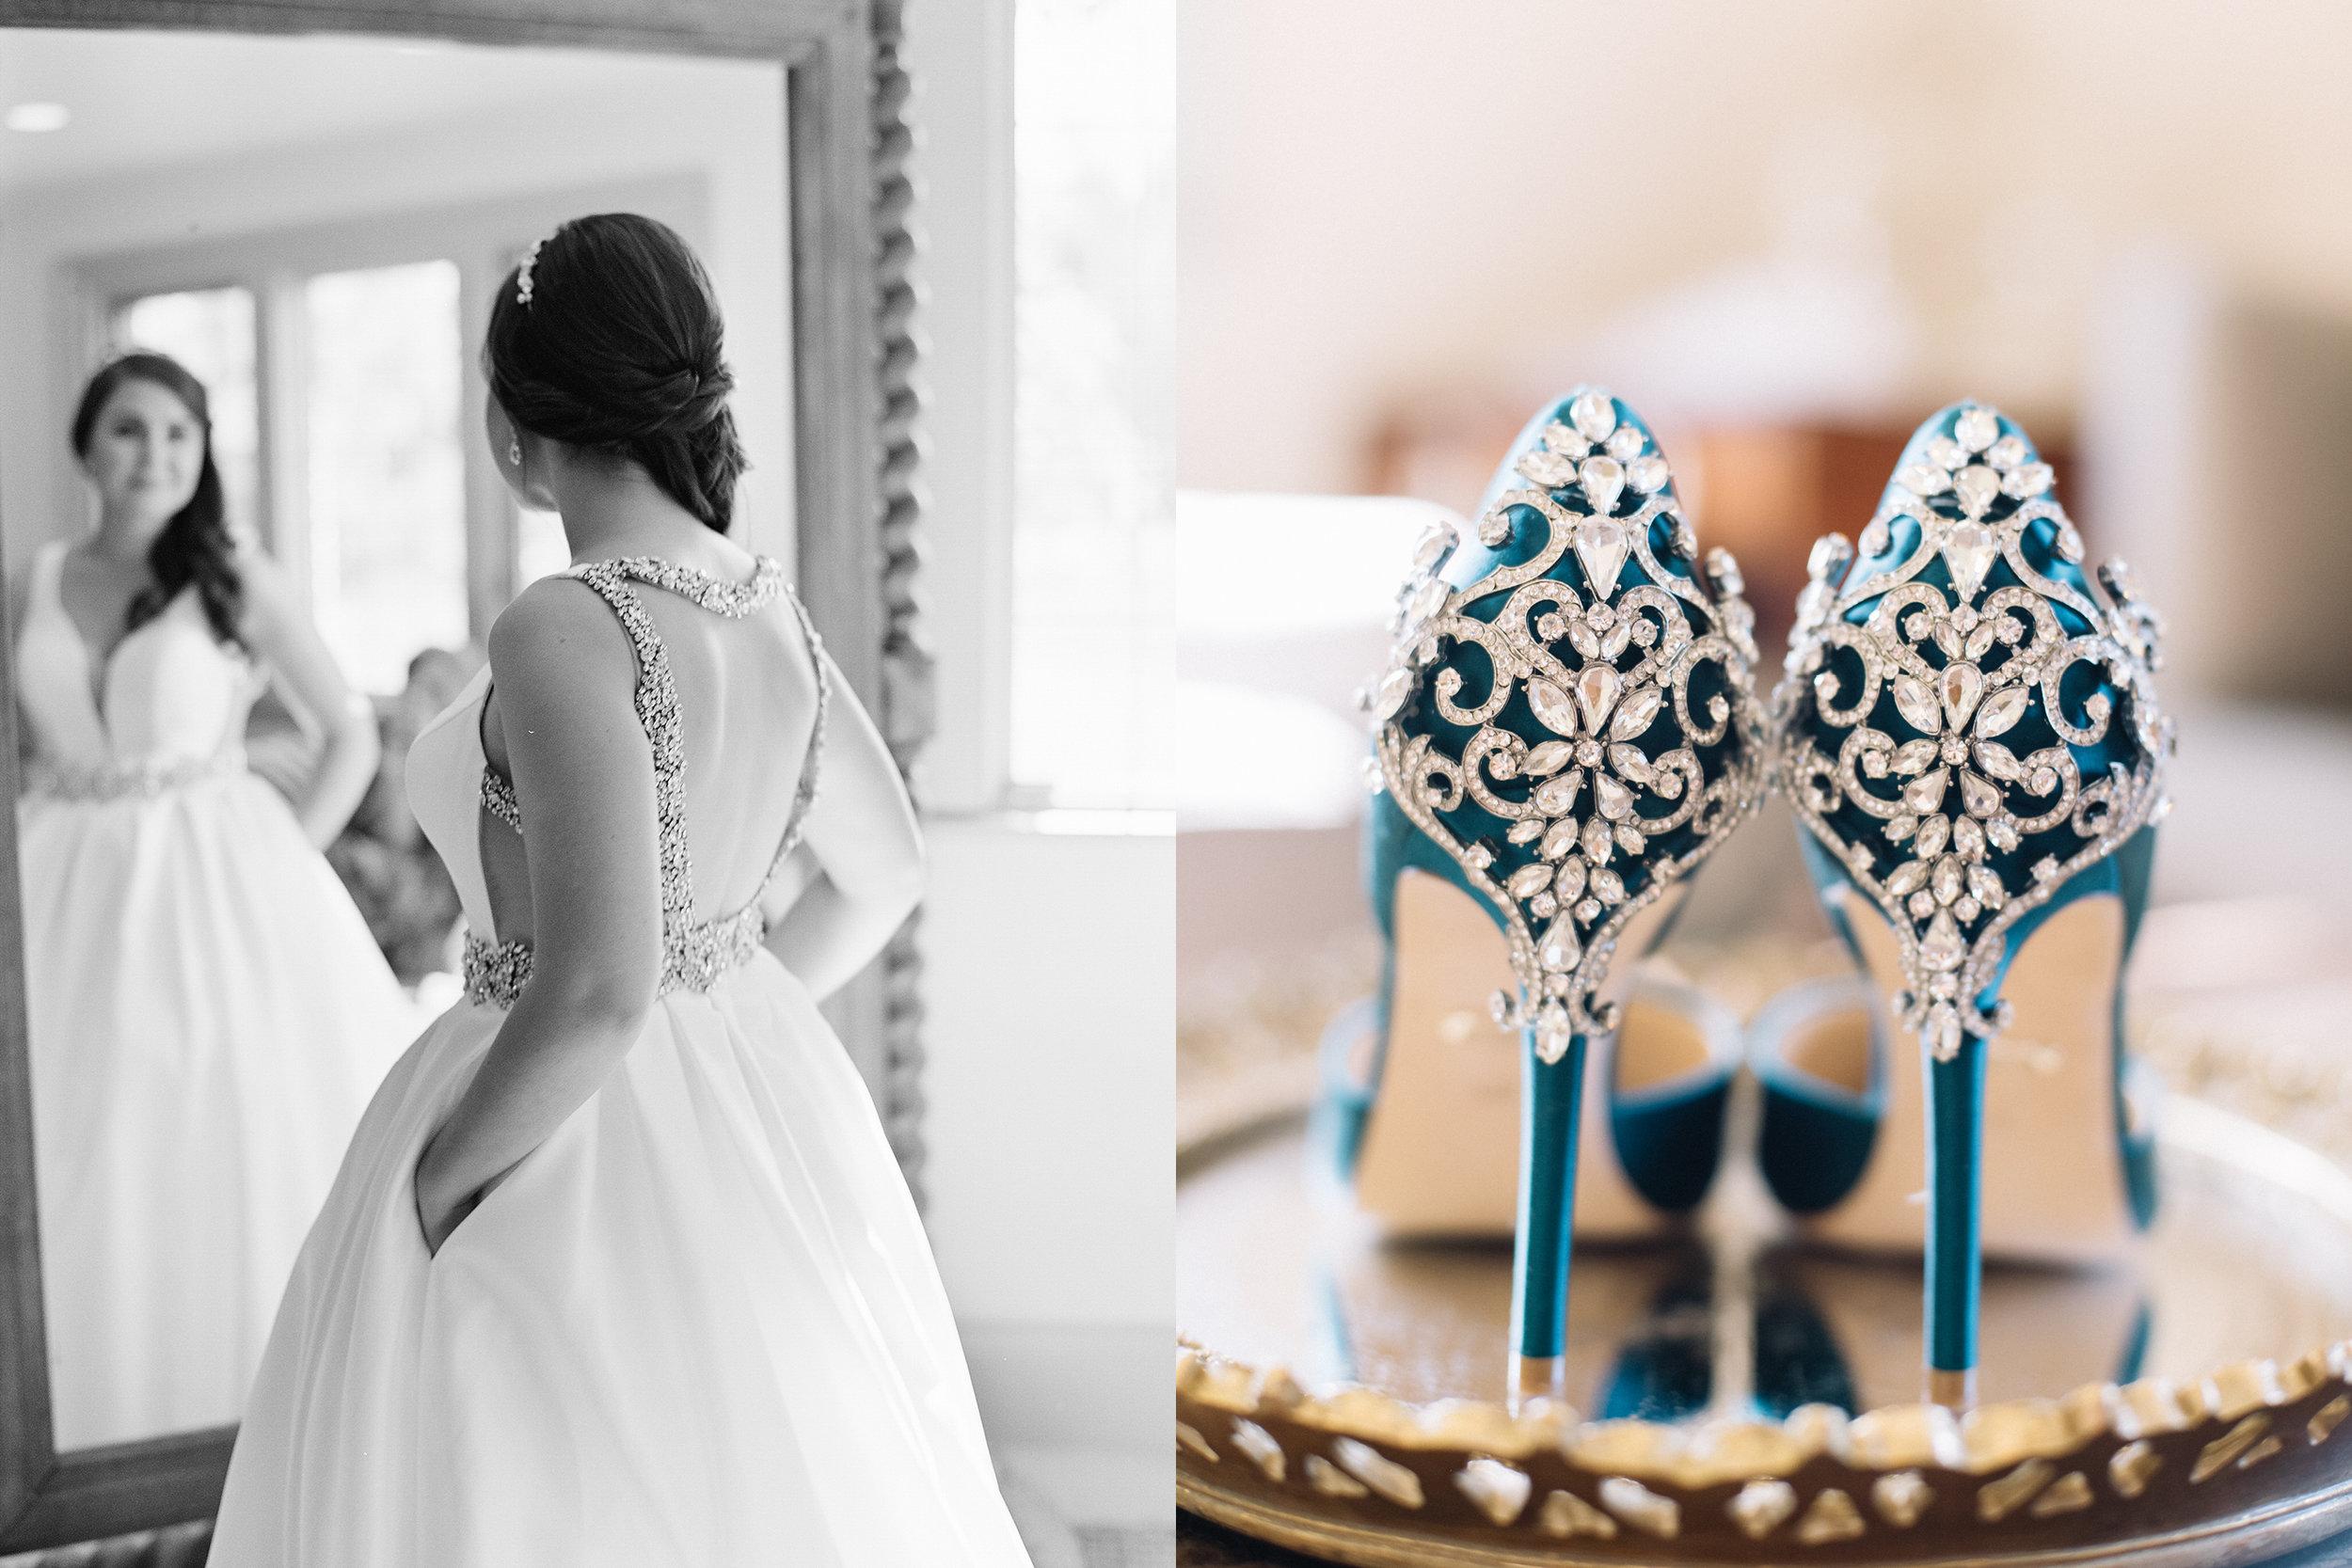 santa-barbara-elopement-elope-wedding-planner-planning-coordinator-day-of-intimate-event-design-kestrel-park-santa-ynez-english-country-estate-garden-castle (6).jpg